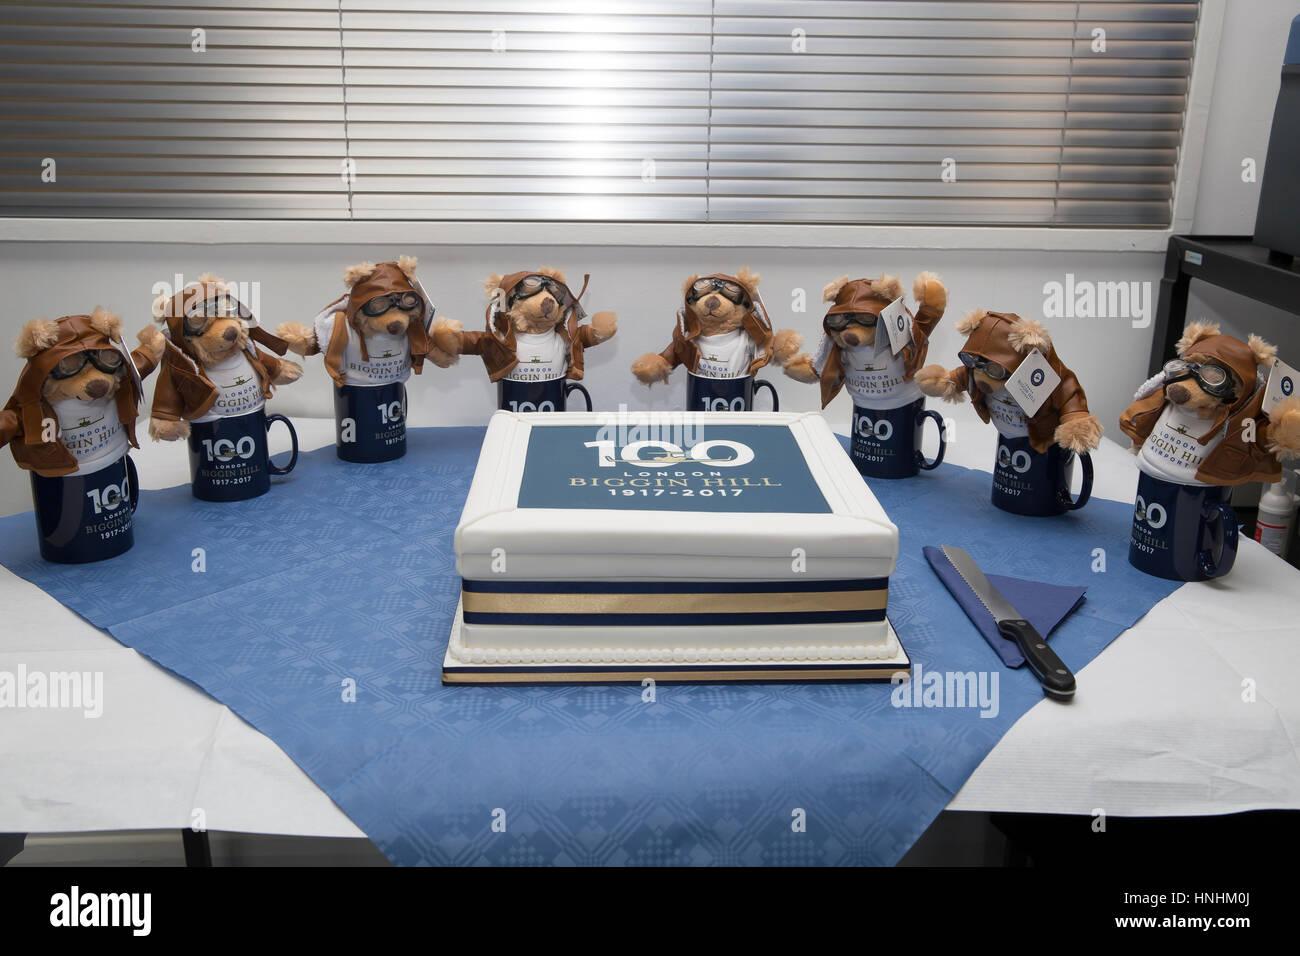 Biggin Hill Uk 13th Feb 2017 Birthday Cake And Bears At The